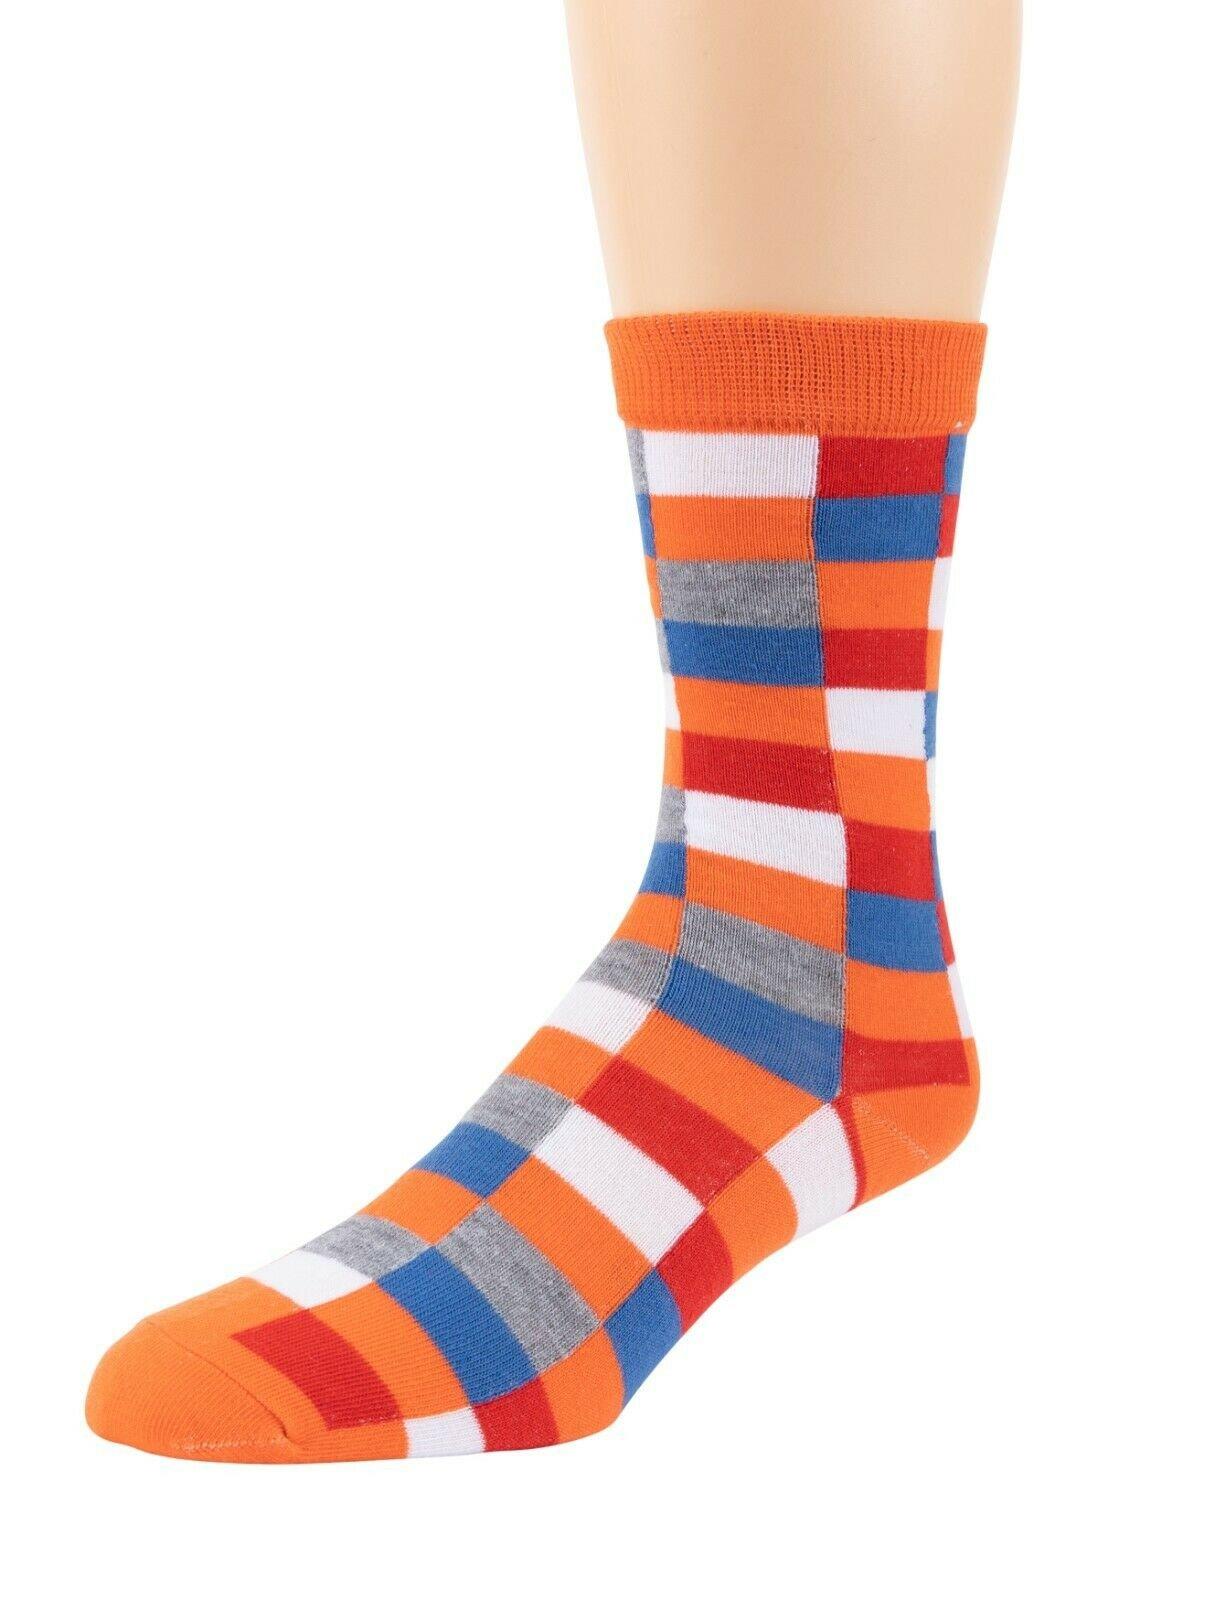 Mitch-Bogen-Mens-Cotton-Dress-Socks-Colorful-Fashion-Crew-Socks-8-Pack-Gift-Box thumbnail 23